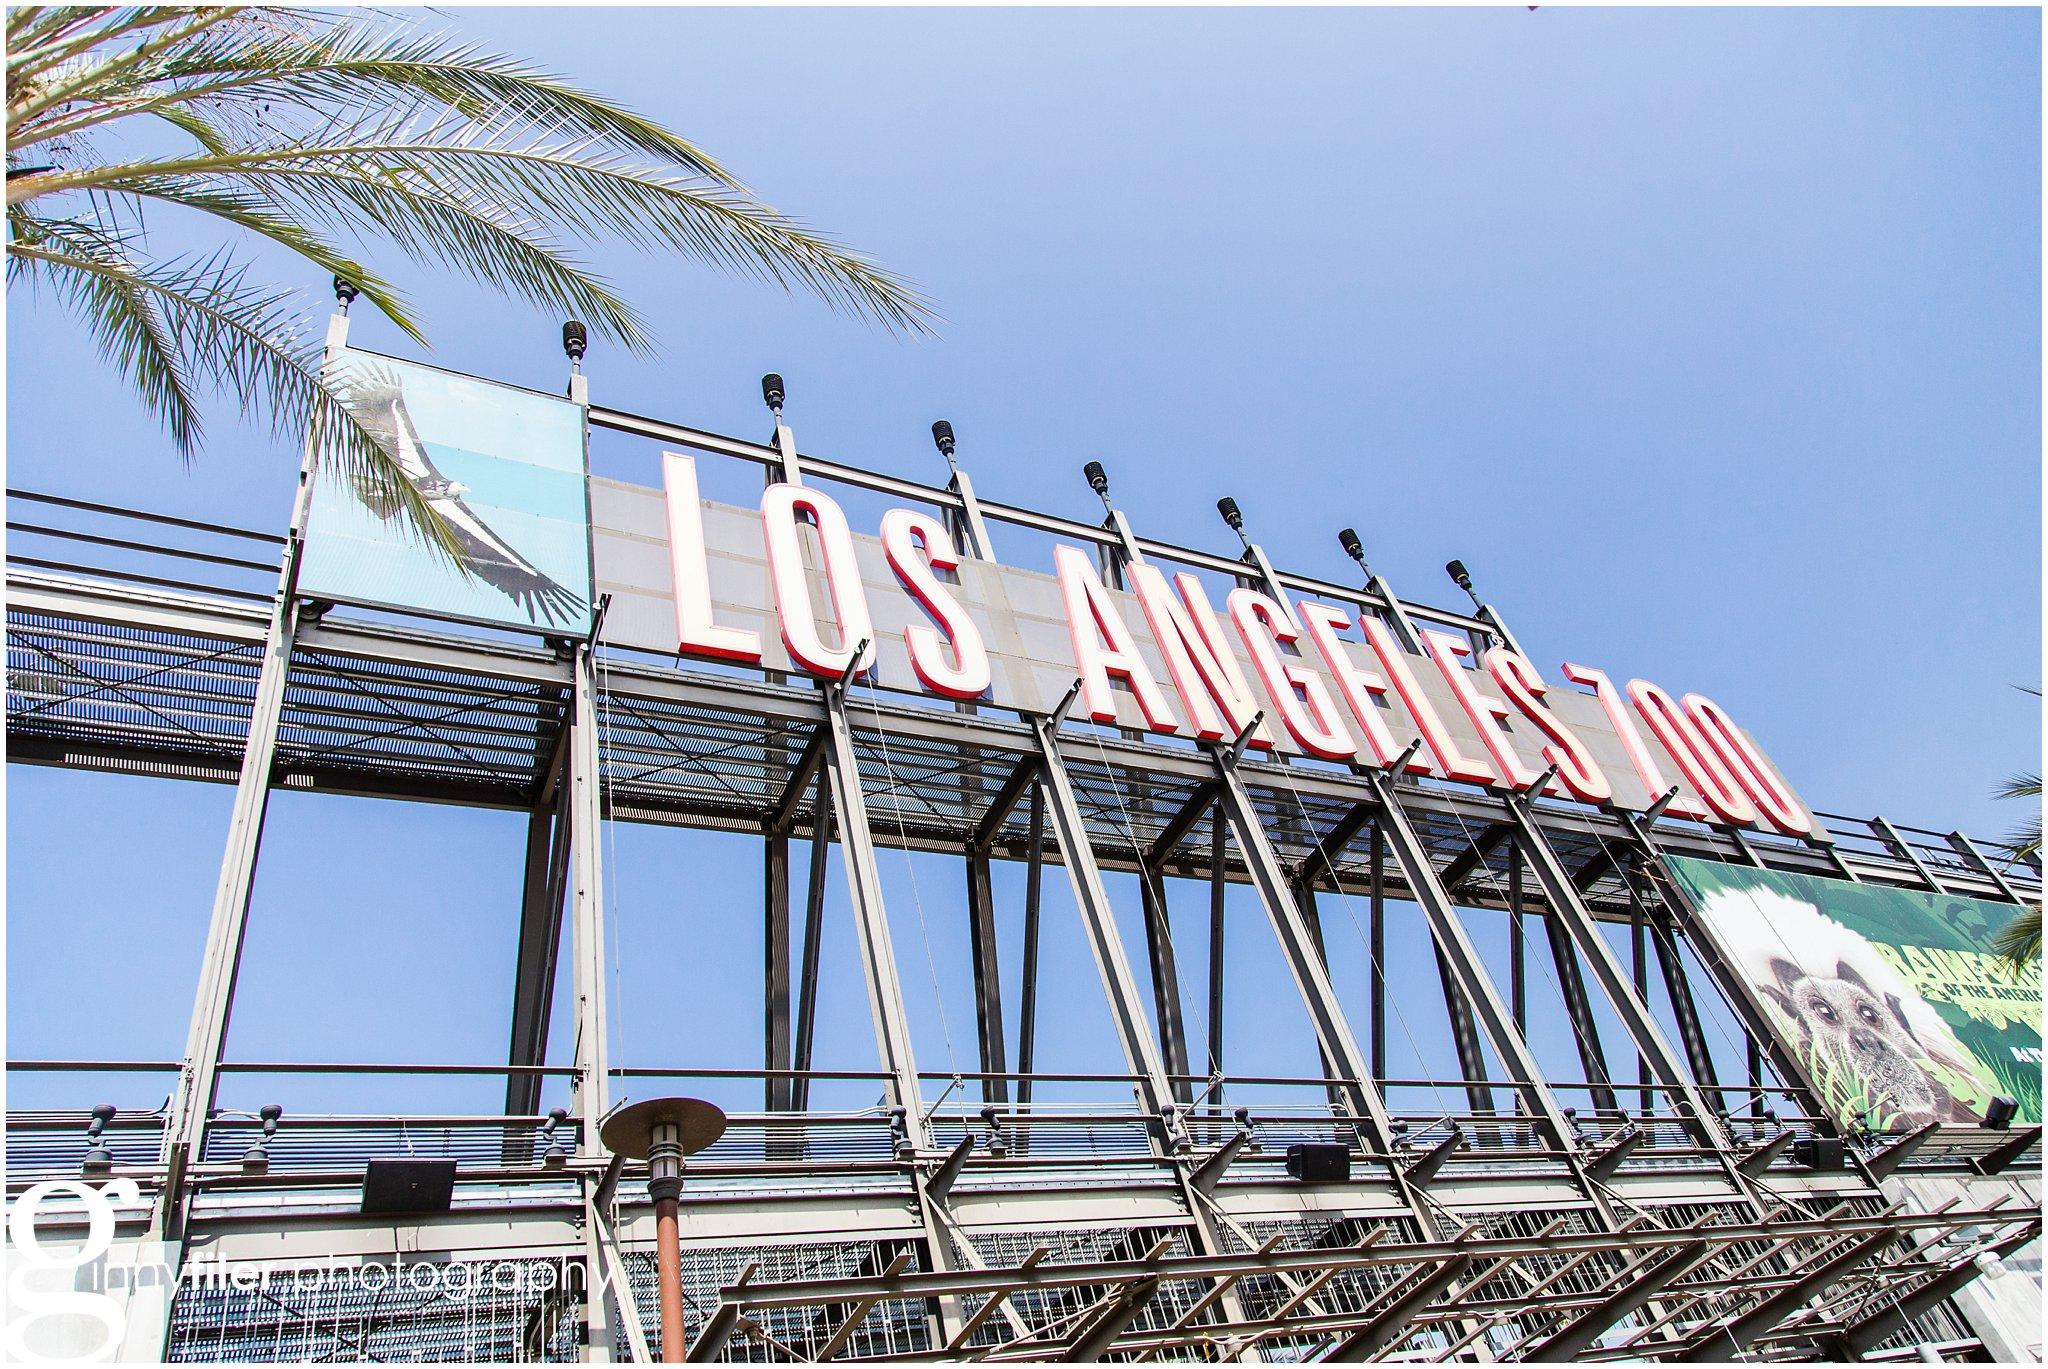 LA_Travel_00003.jpg